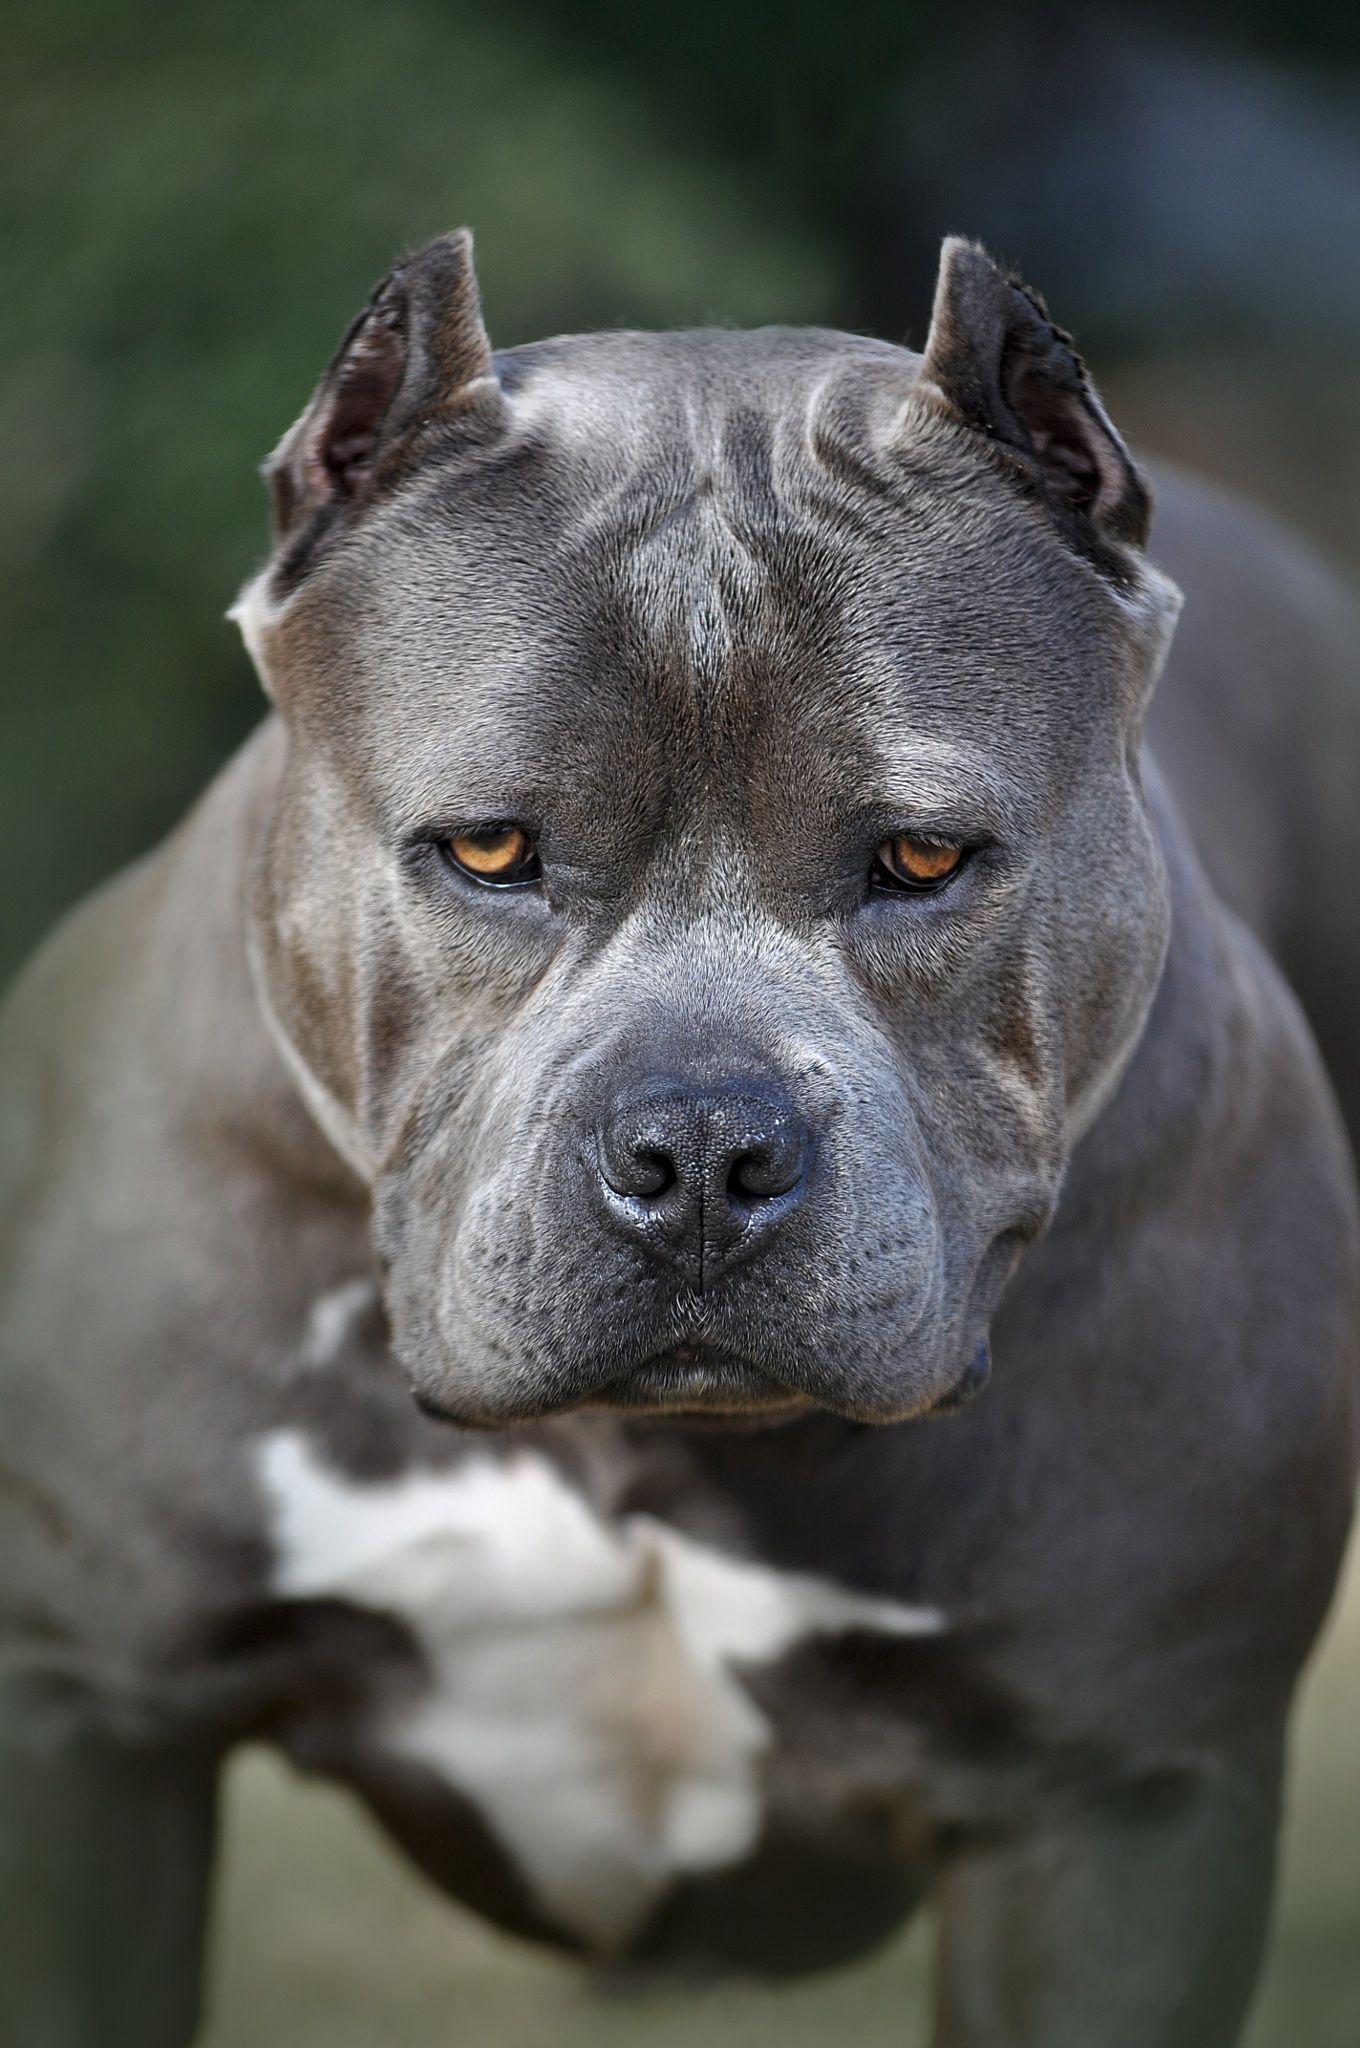 Xica Xica Abkc Gr Ch Gomez S Xica Breed American Bully Dogs Sleeping Dogs Pitbulls